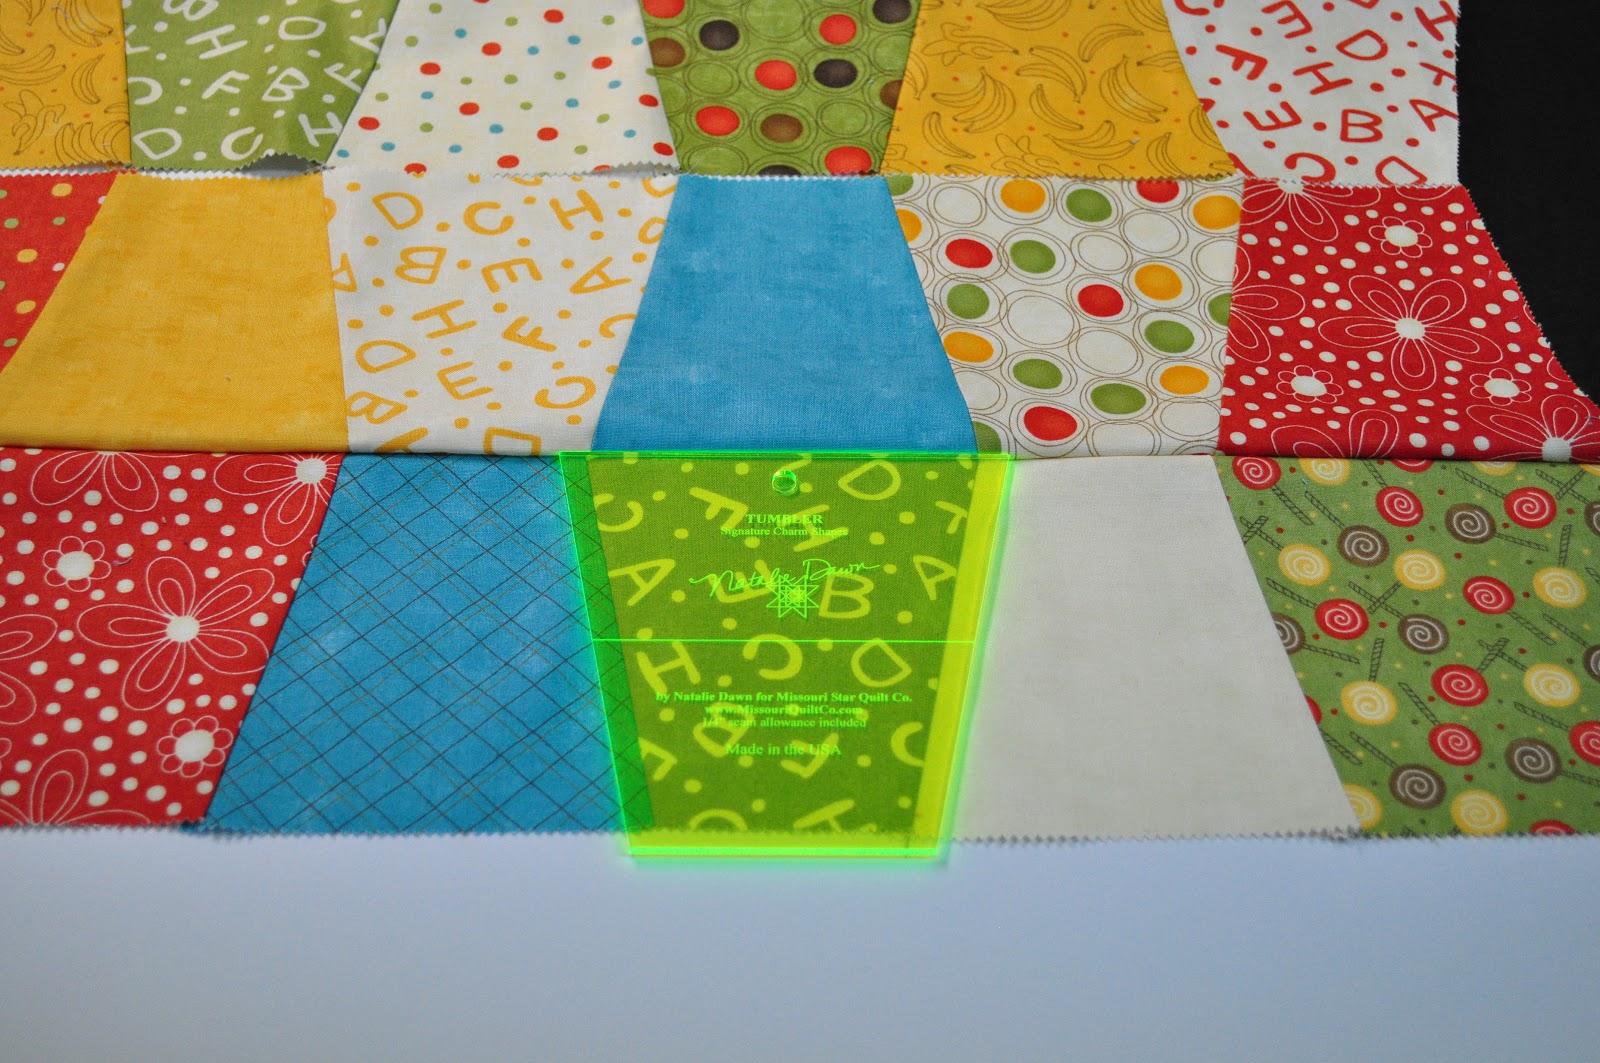 Missouri Star Quilt Company Retreats.Sunshine In The Attic. 28 ... : missouri star quilt company forum - Adamdwight.com